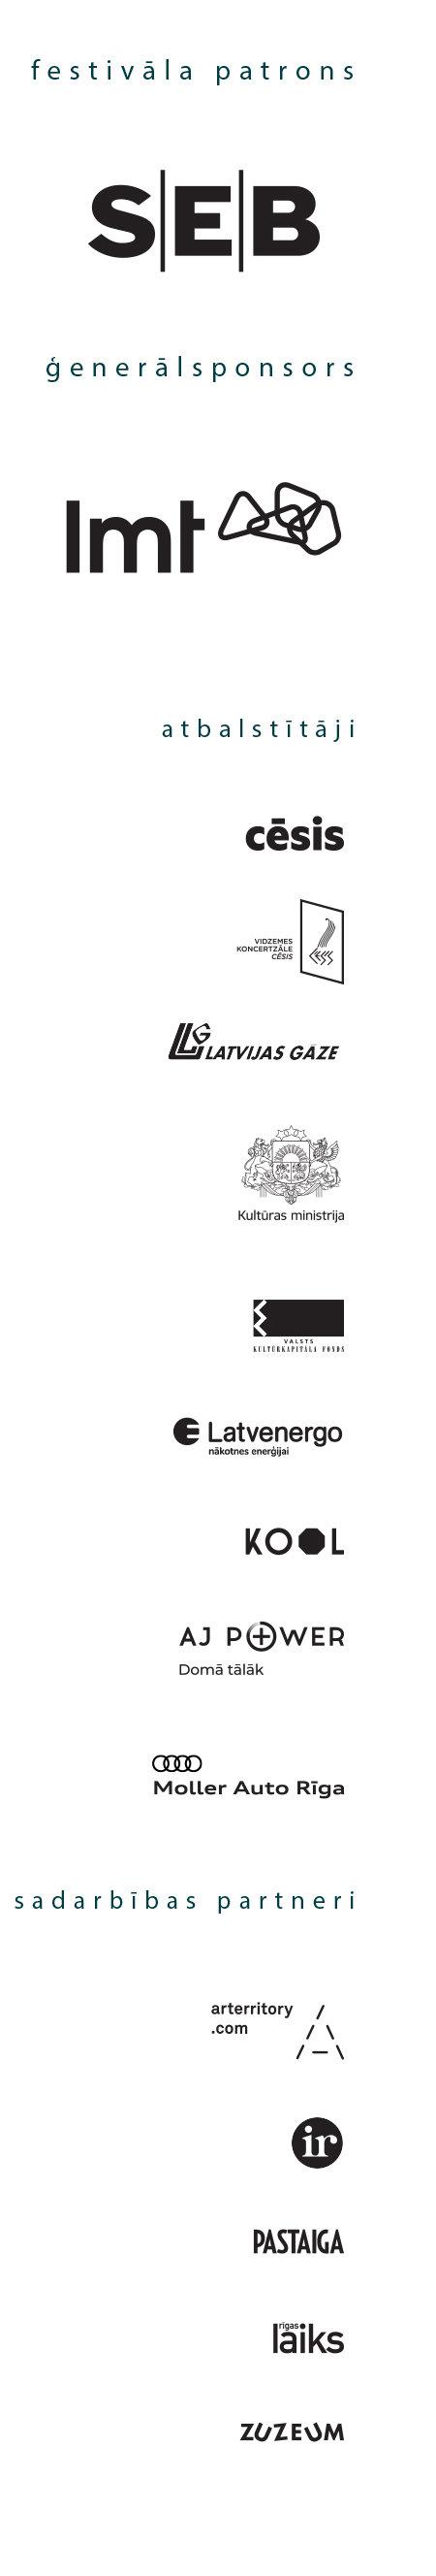 LogoSterbele.jpg